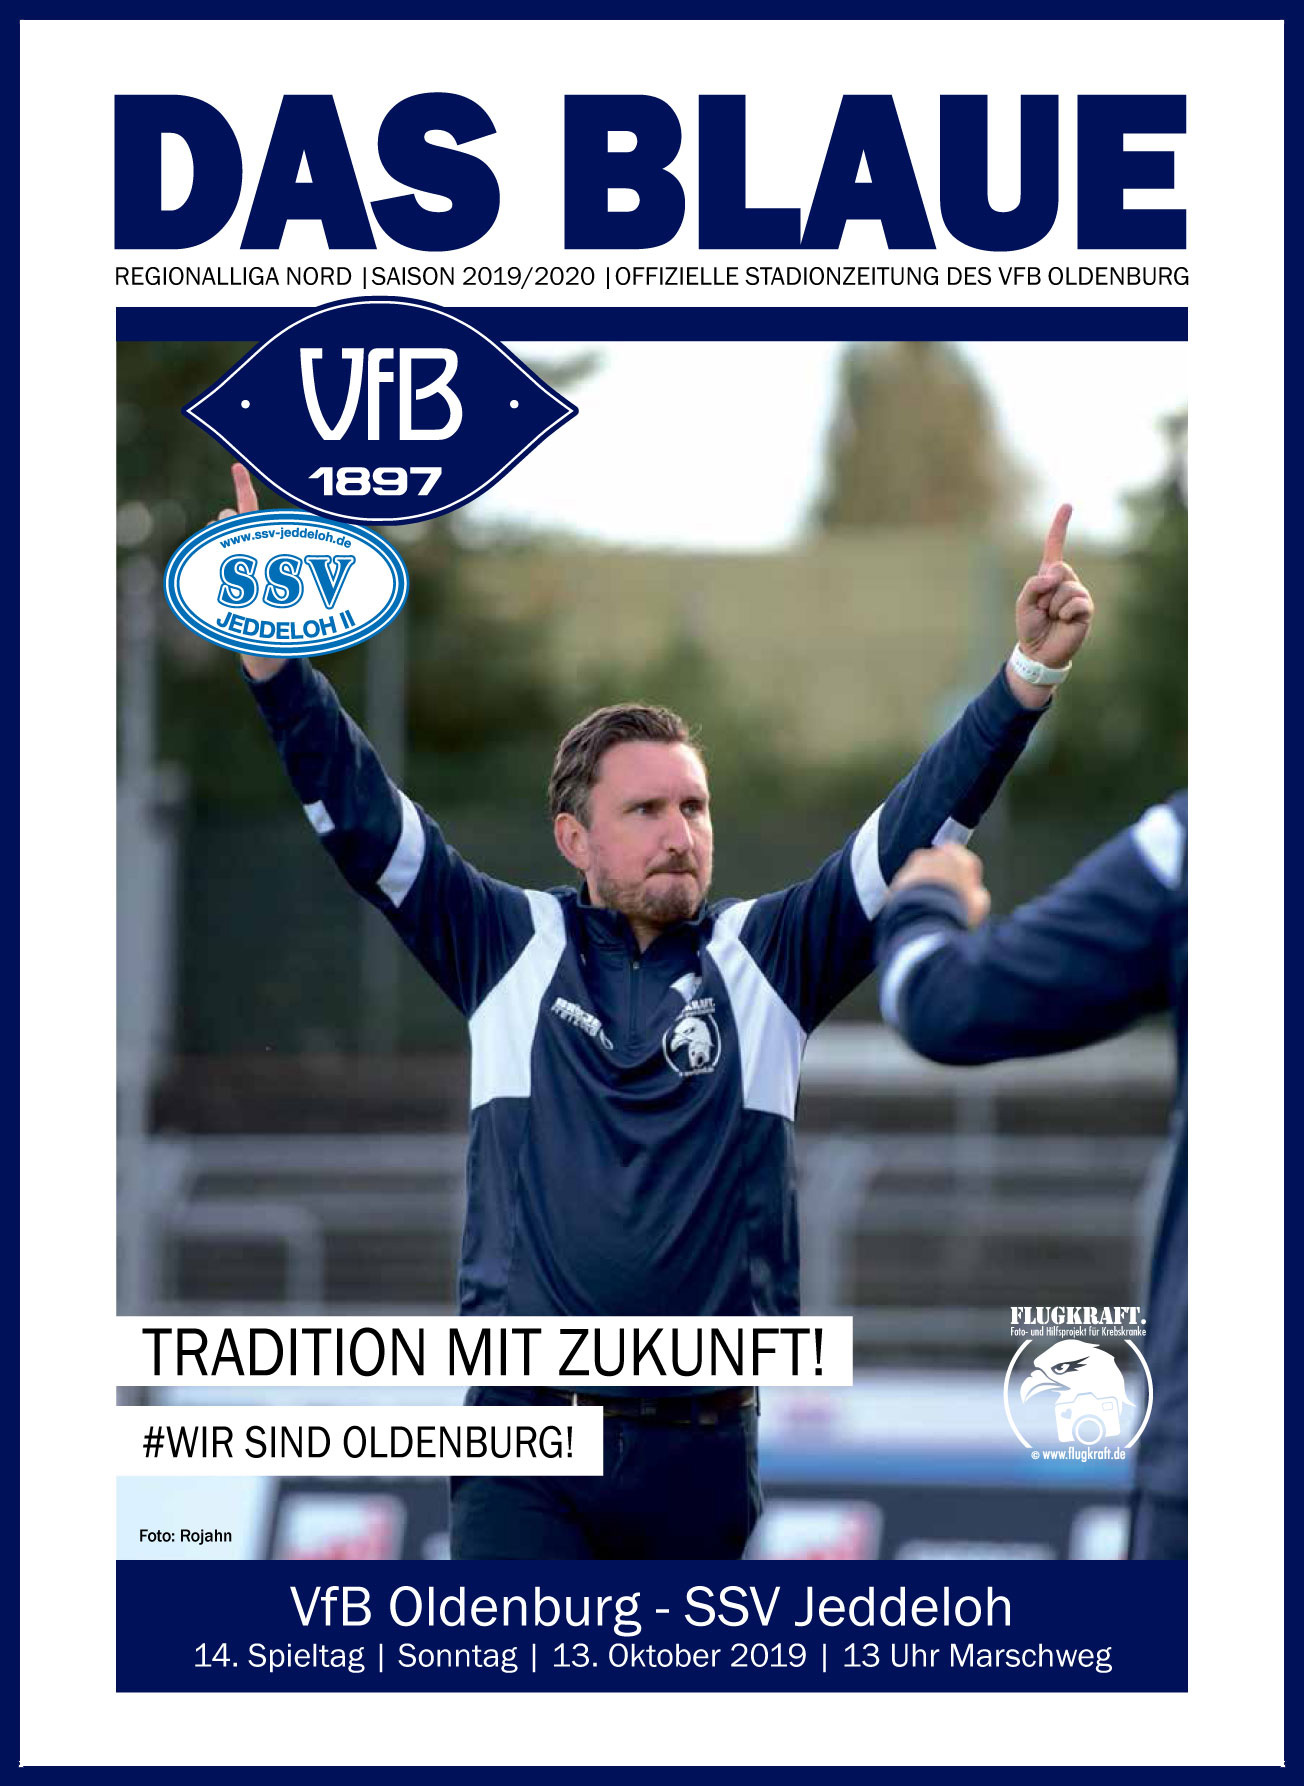 https://vfb-oldenburg.de/wp-content/uploads/VFB_Oldenburg_14_Spieltag_2019_2020.jpg